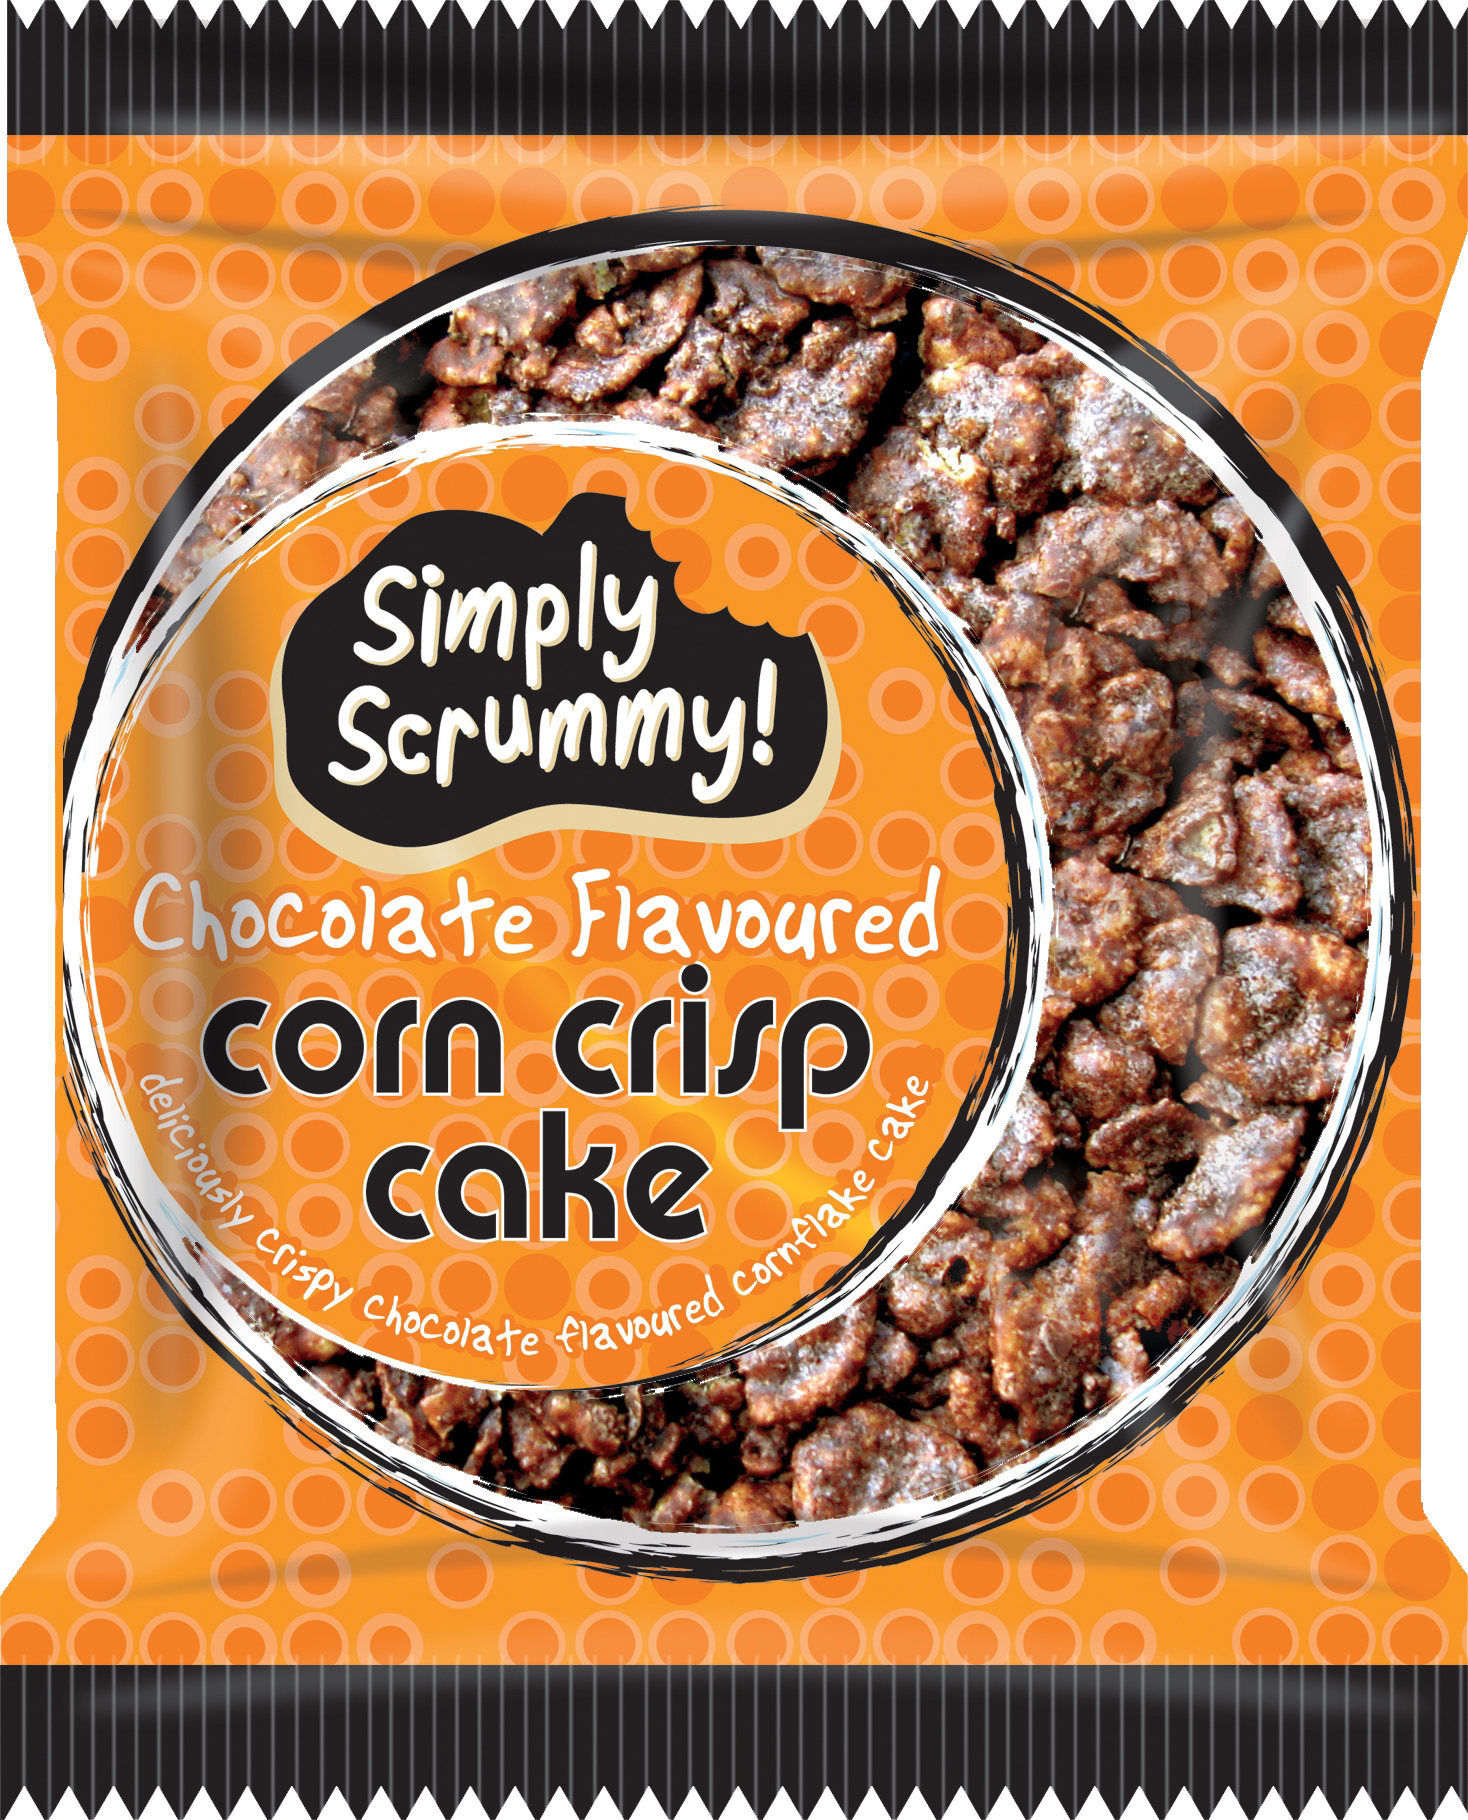 SS 069 Choc Corn Crisp Cake